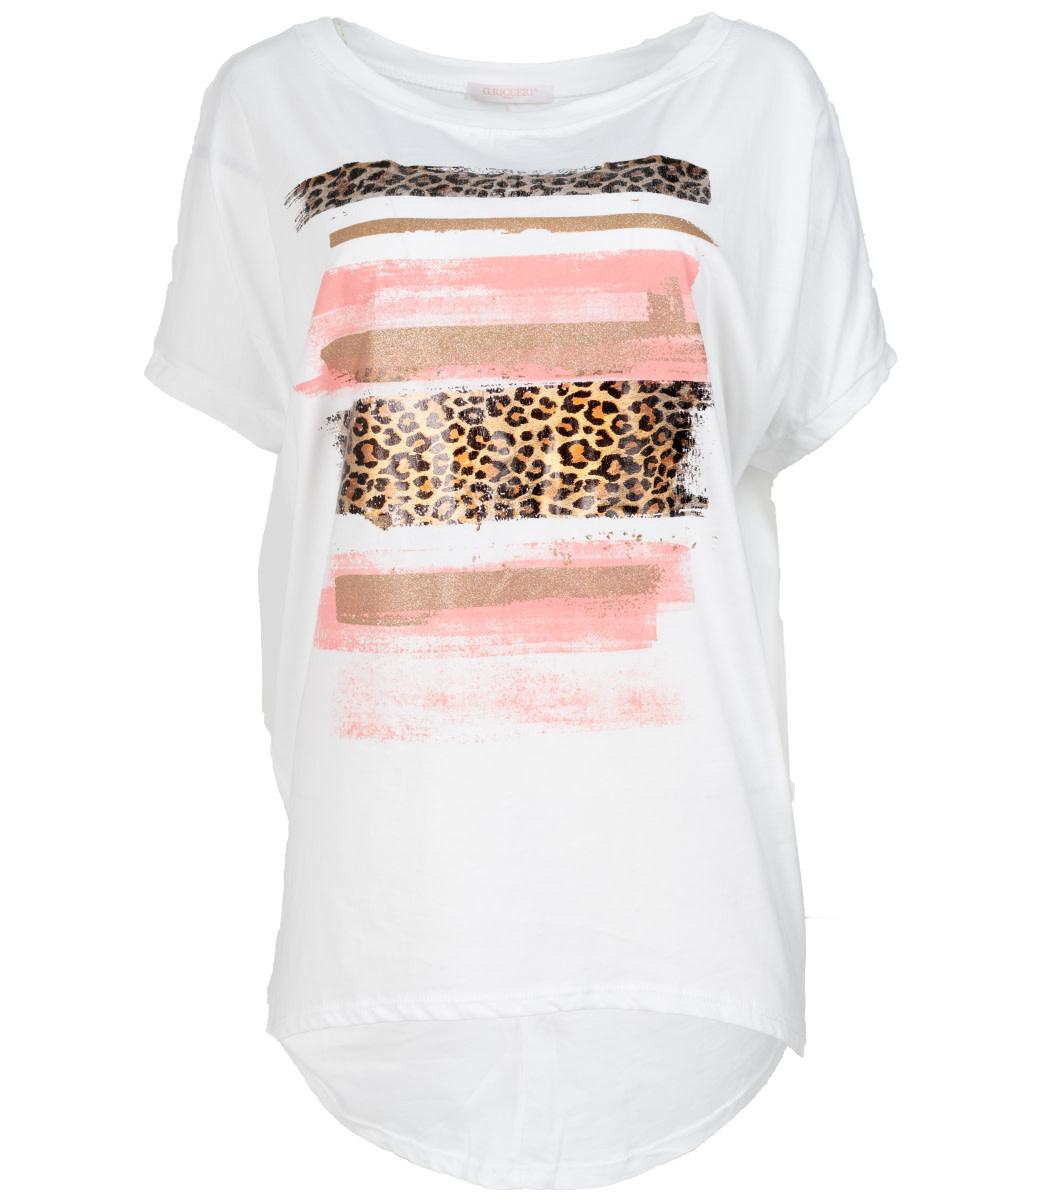 Gemma Ricceri Shirt wit/roze Chloe